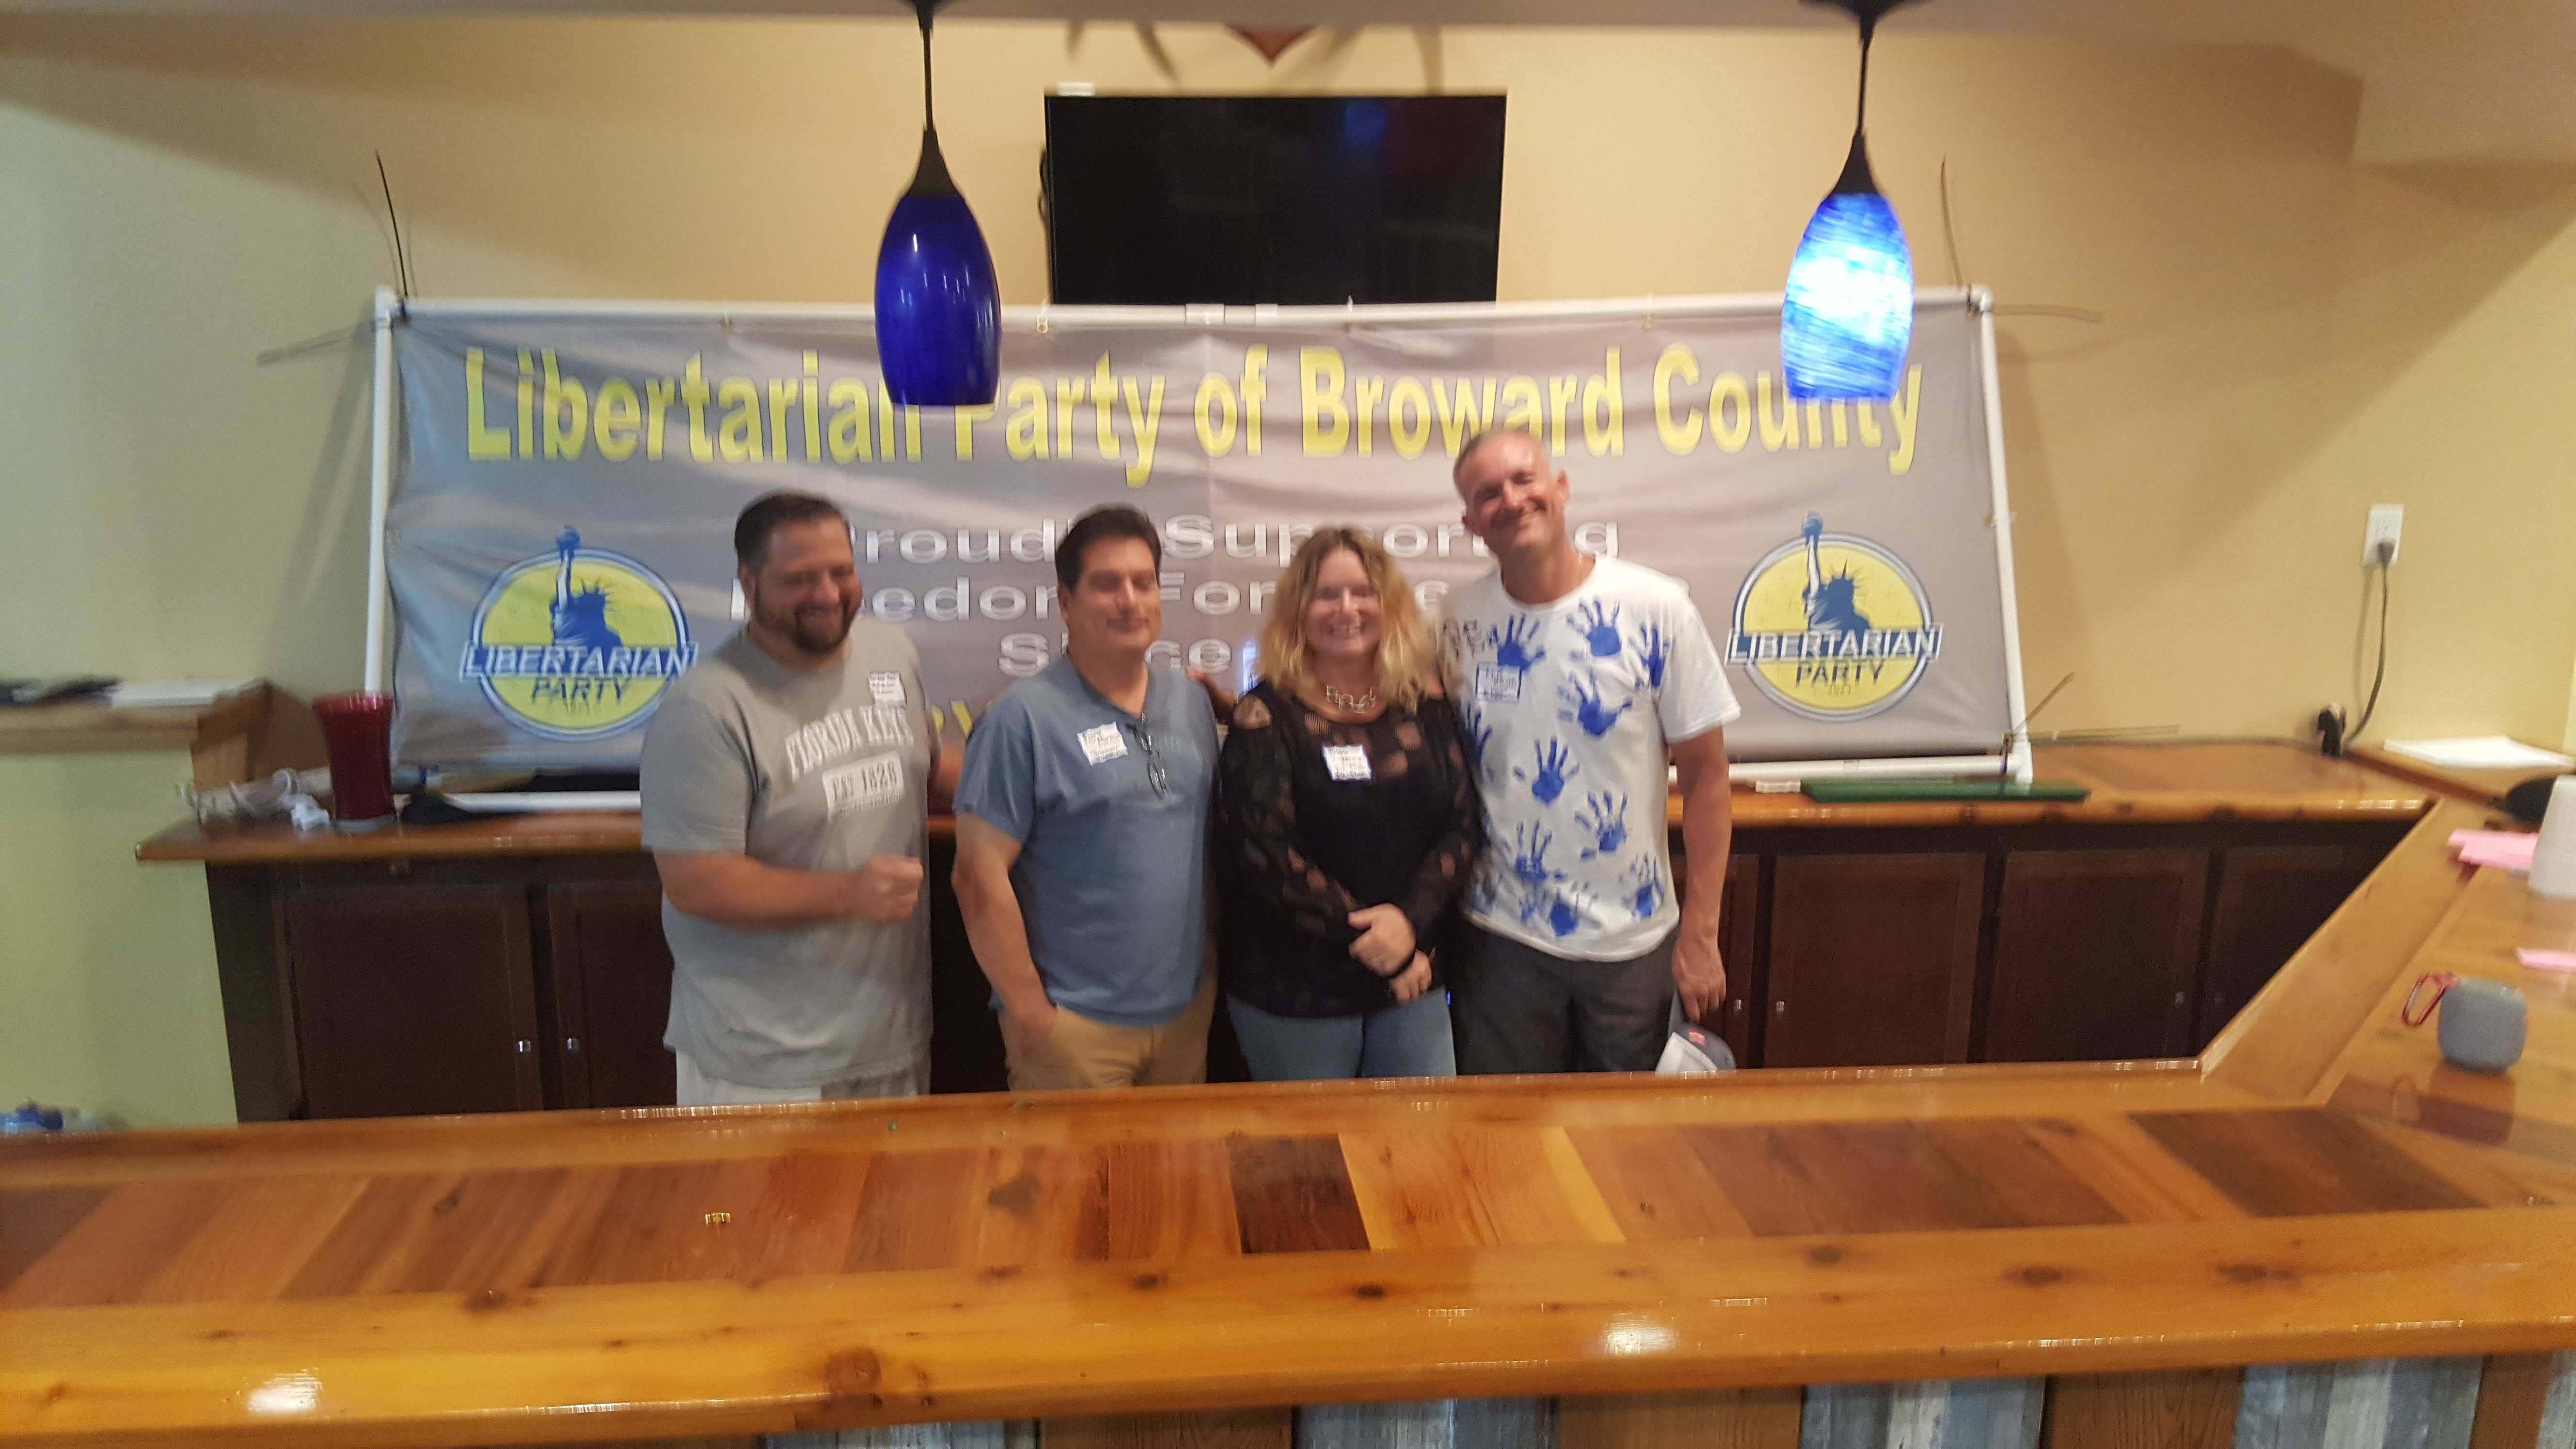 Libertarian Party of Broward County